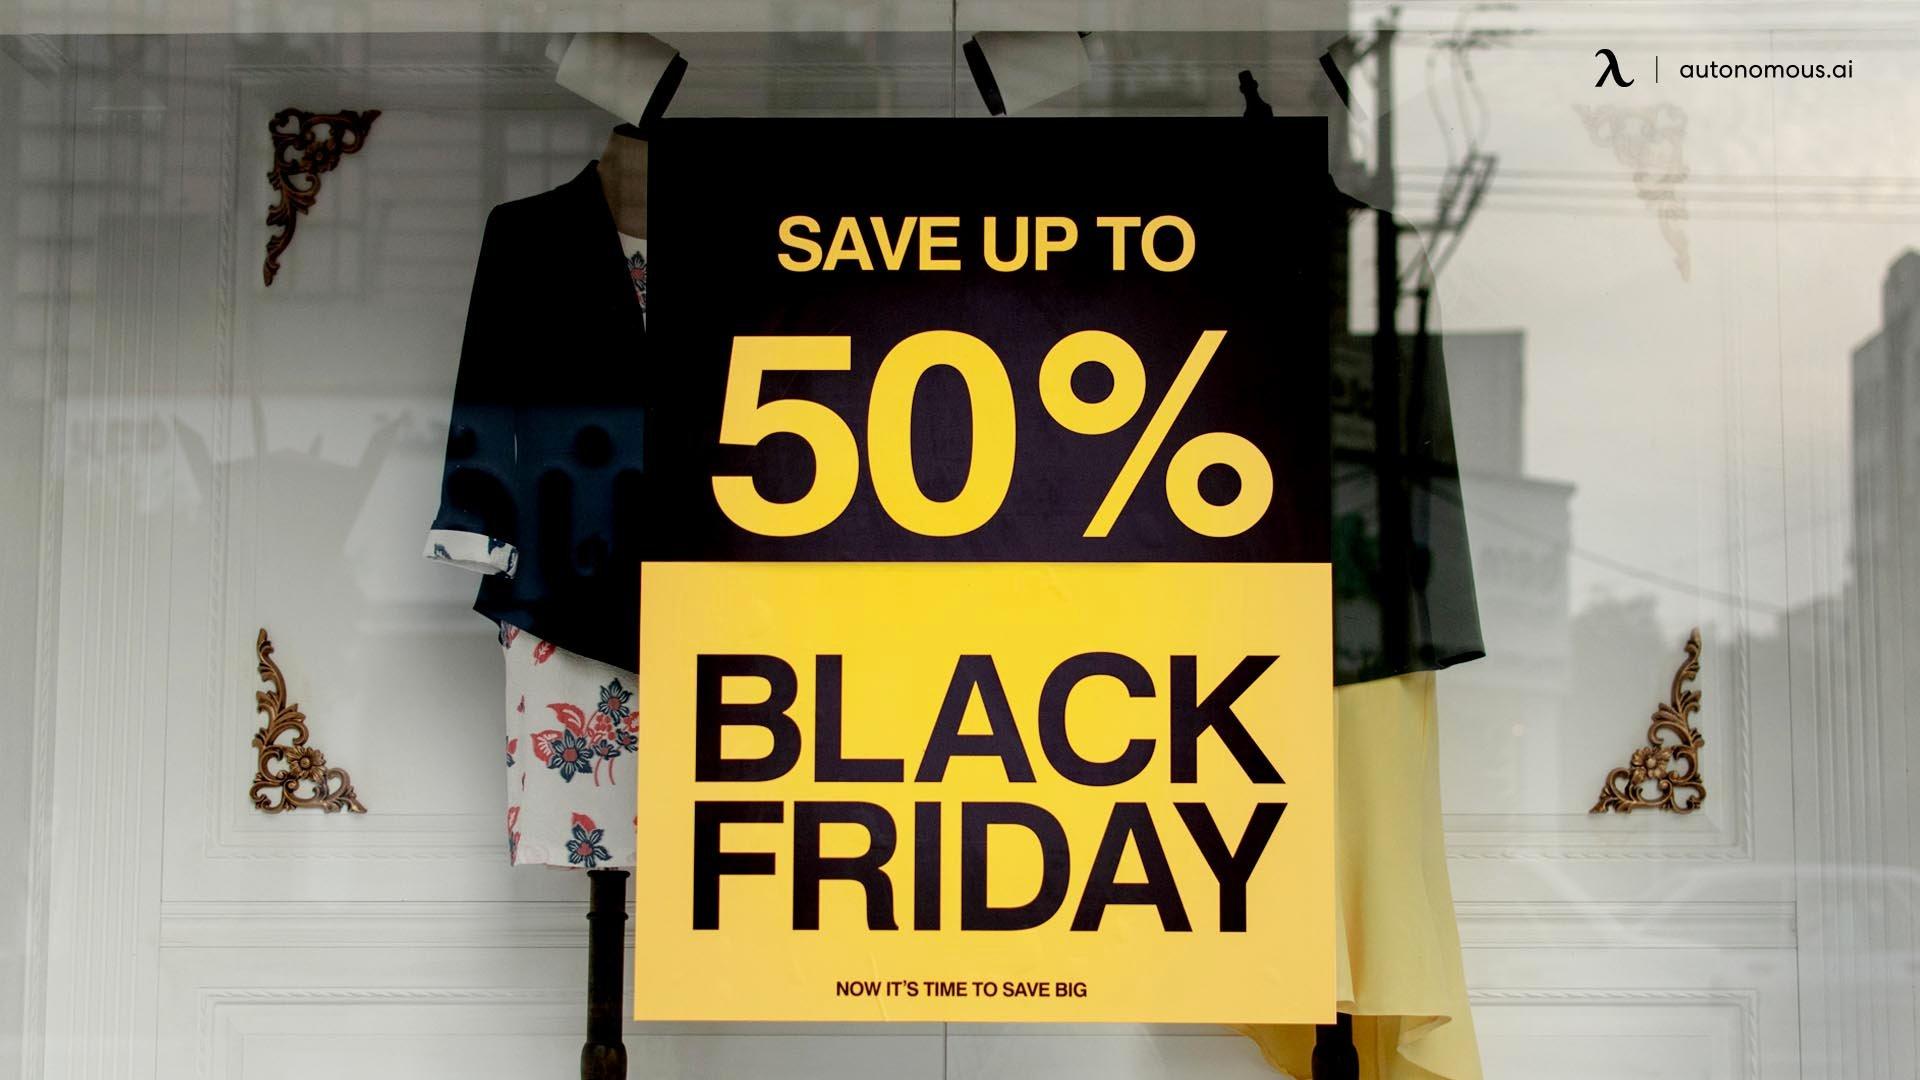 Are Black Friday sales worth it